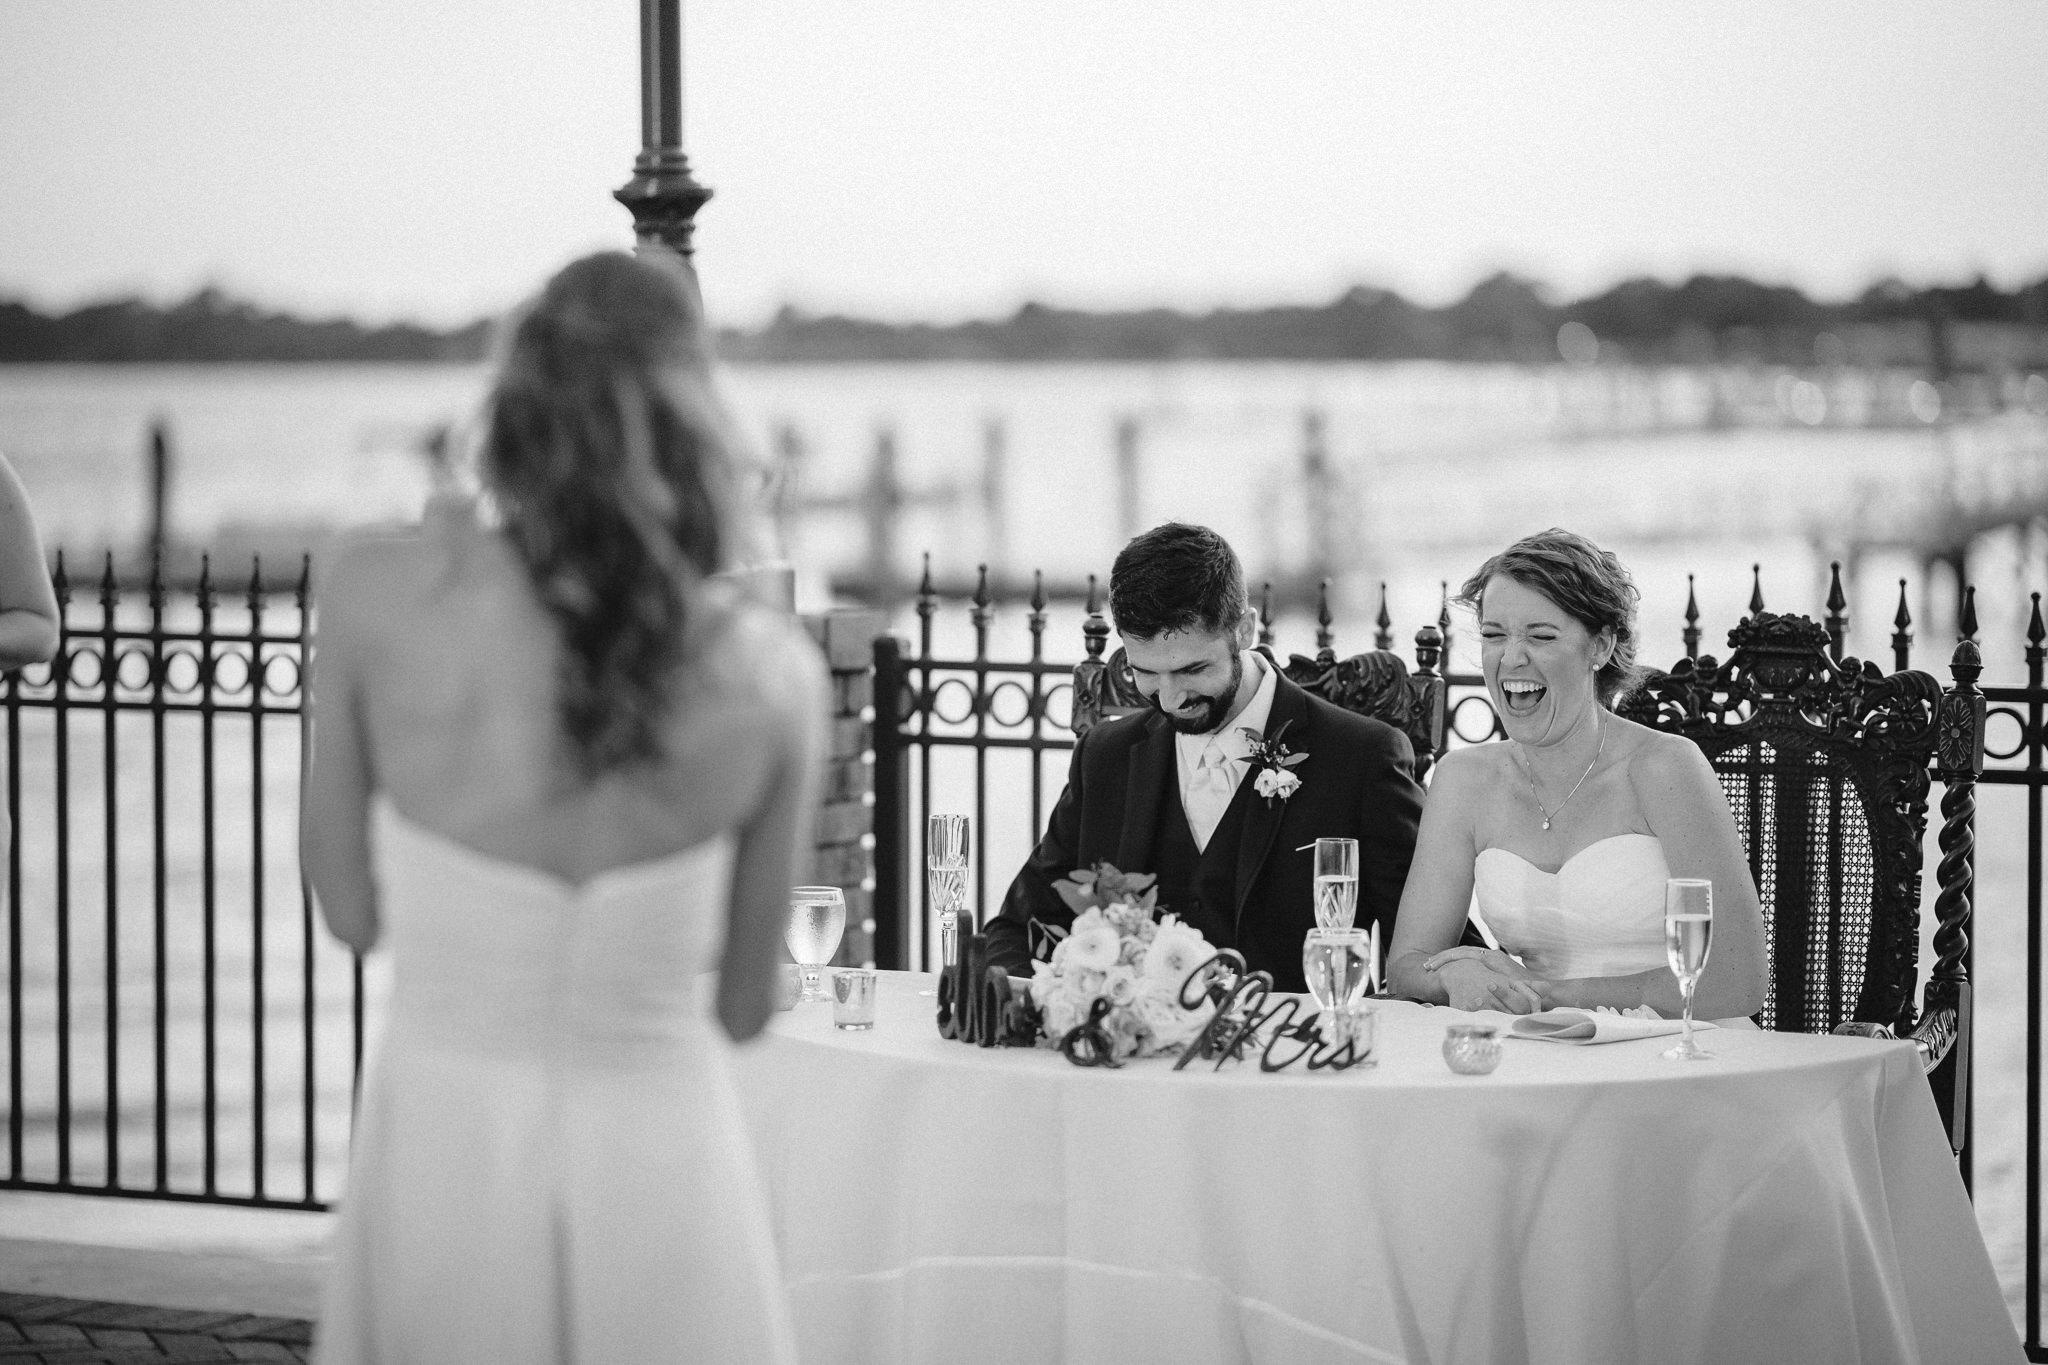 Tavares+Pavilion+on+the+Lake+Wedding+Florida_039.jpg